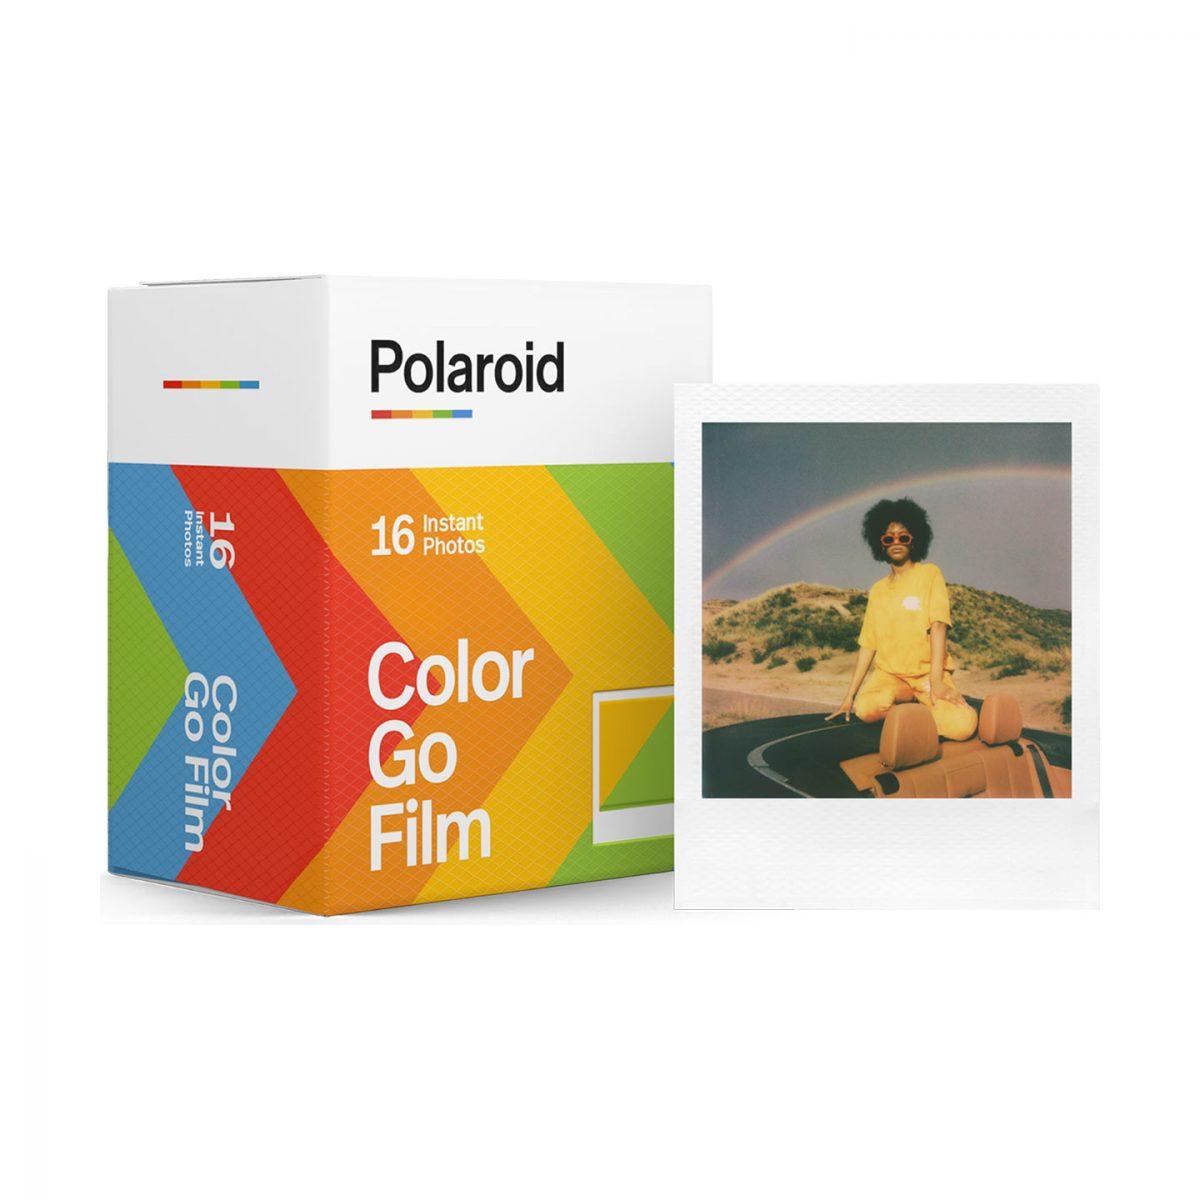 polaroid_go_color_film_01